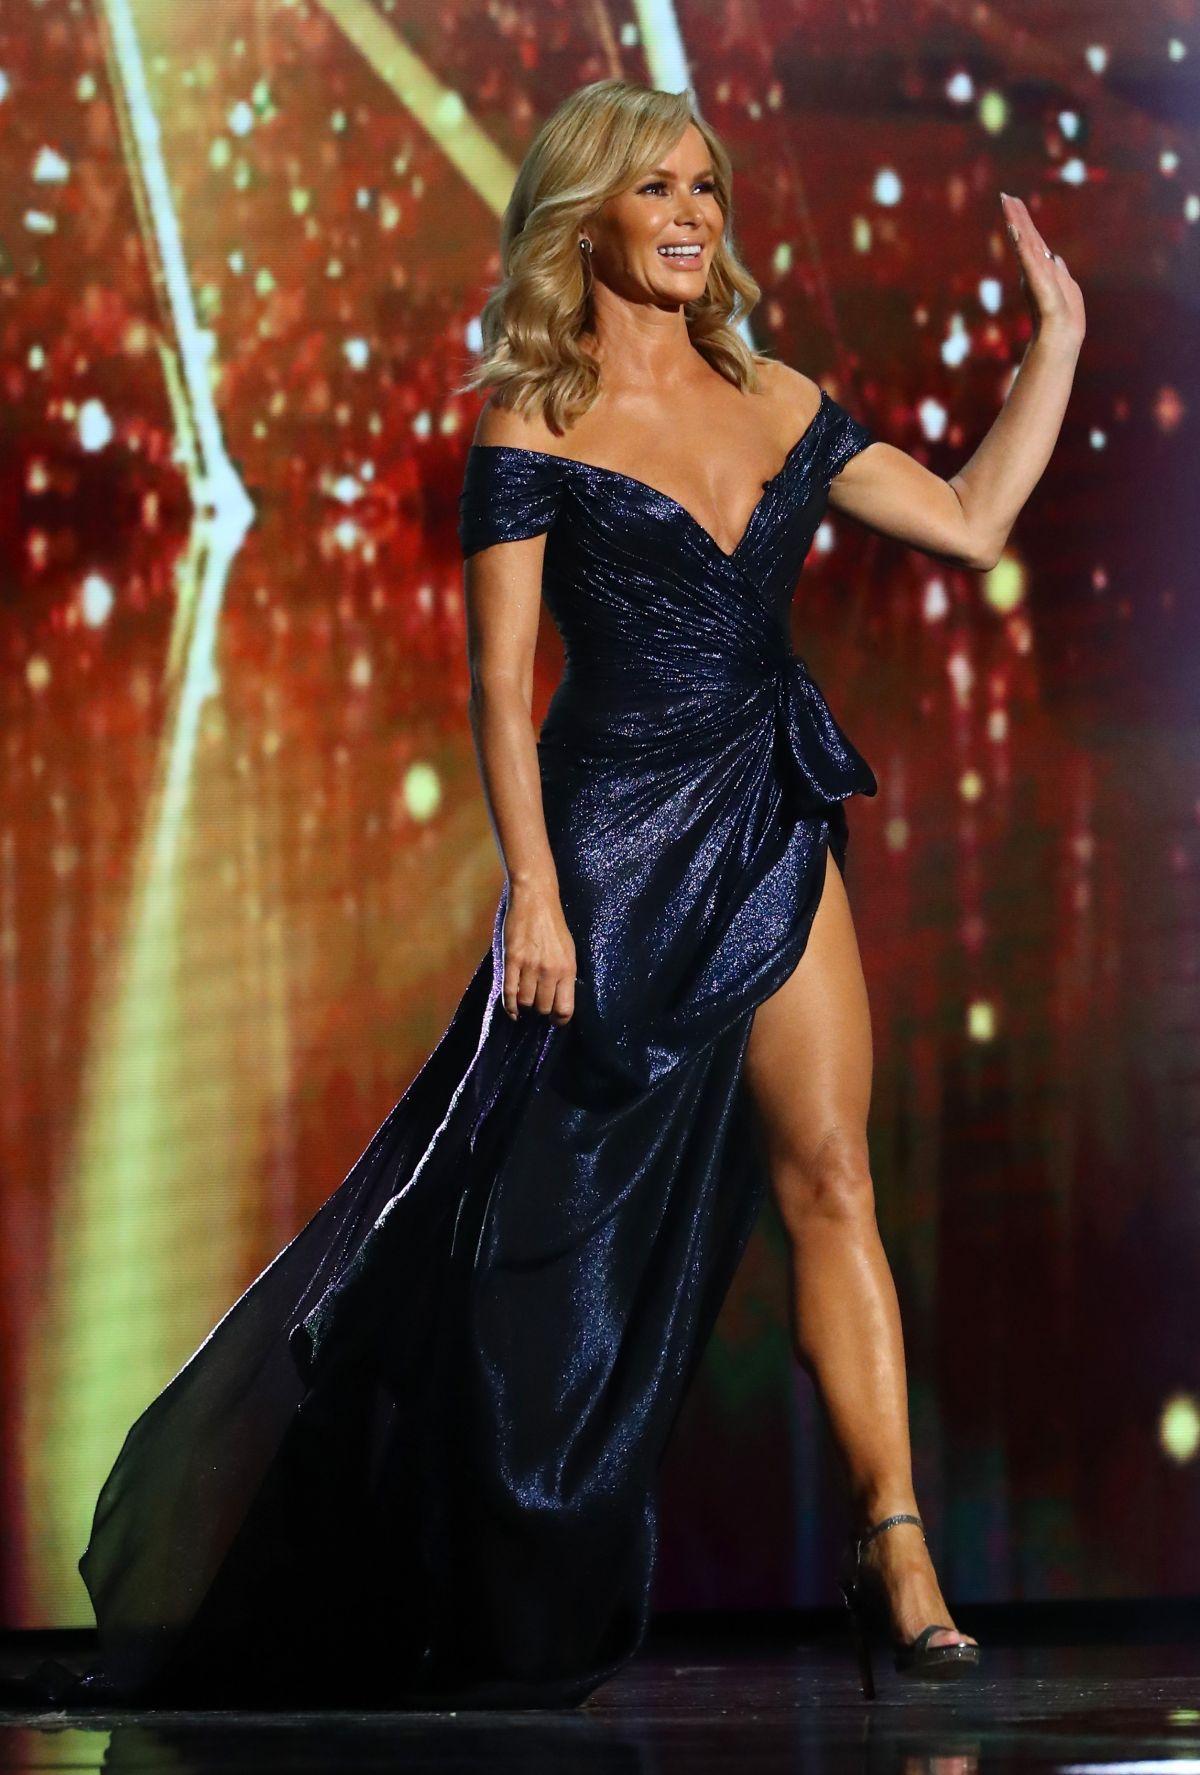 AMANDA HOLDEN at Britain's Got Talent 09/26/2020 - HawtCelebs